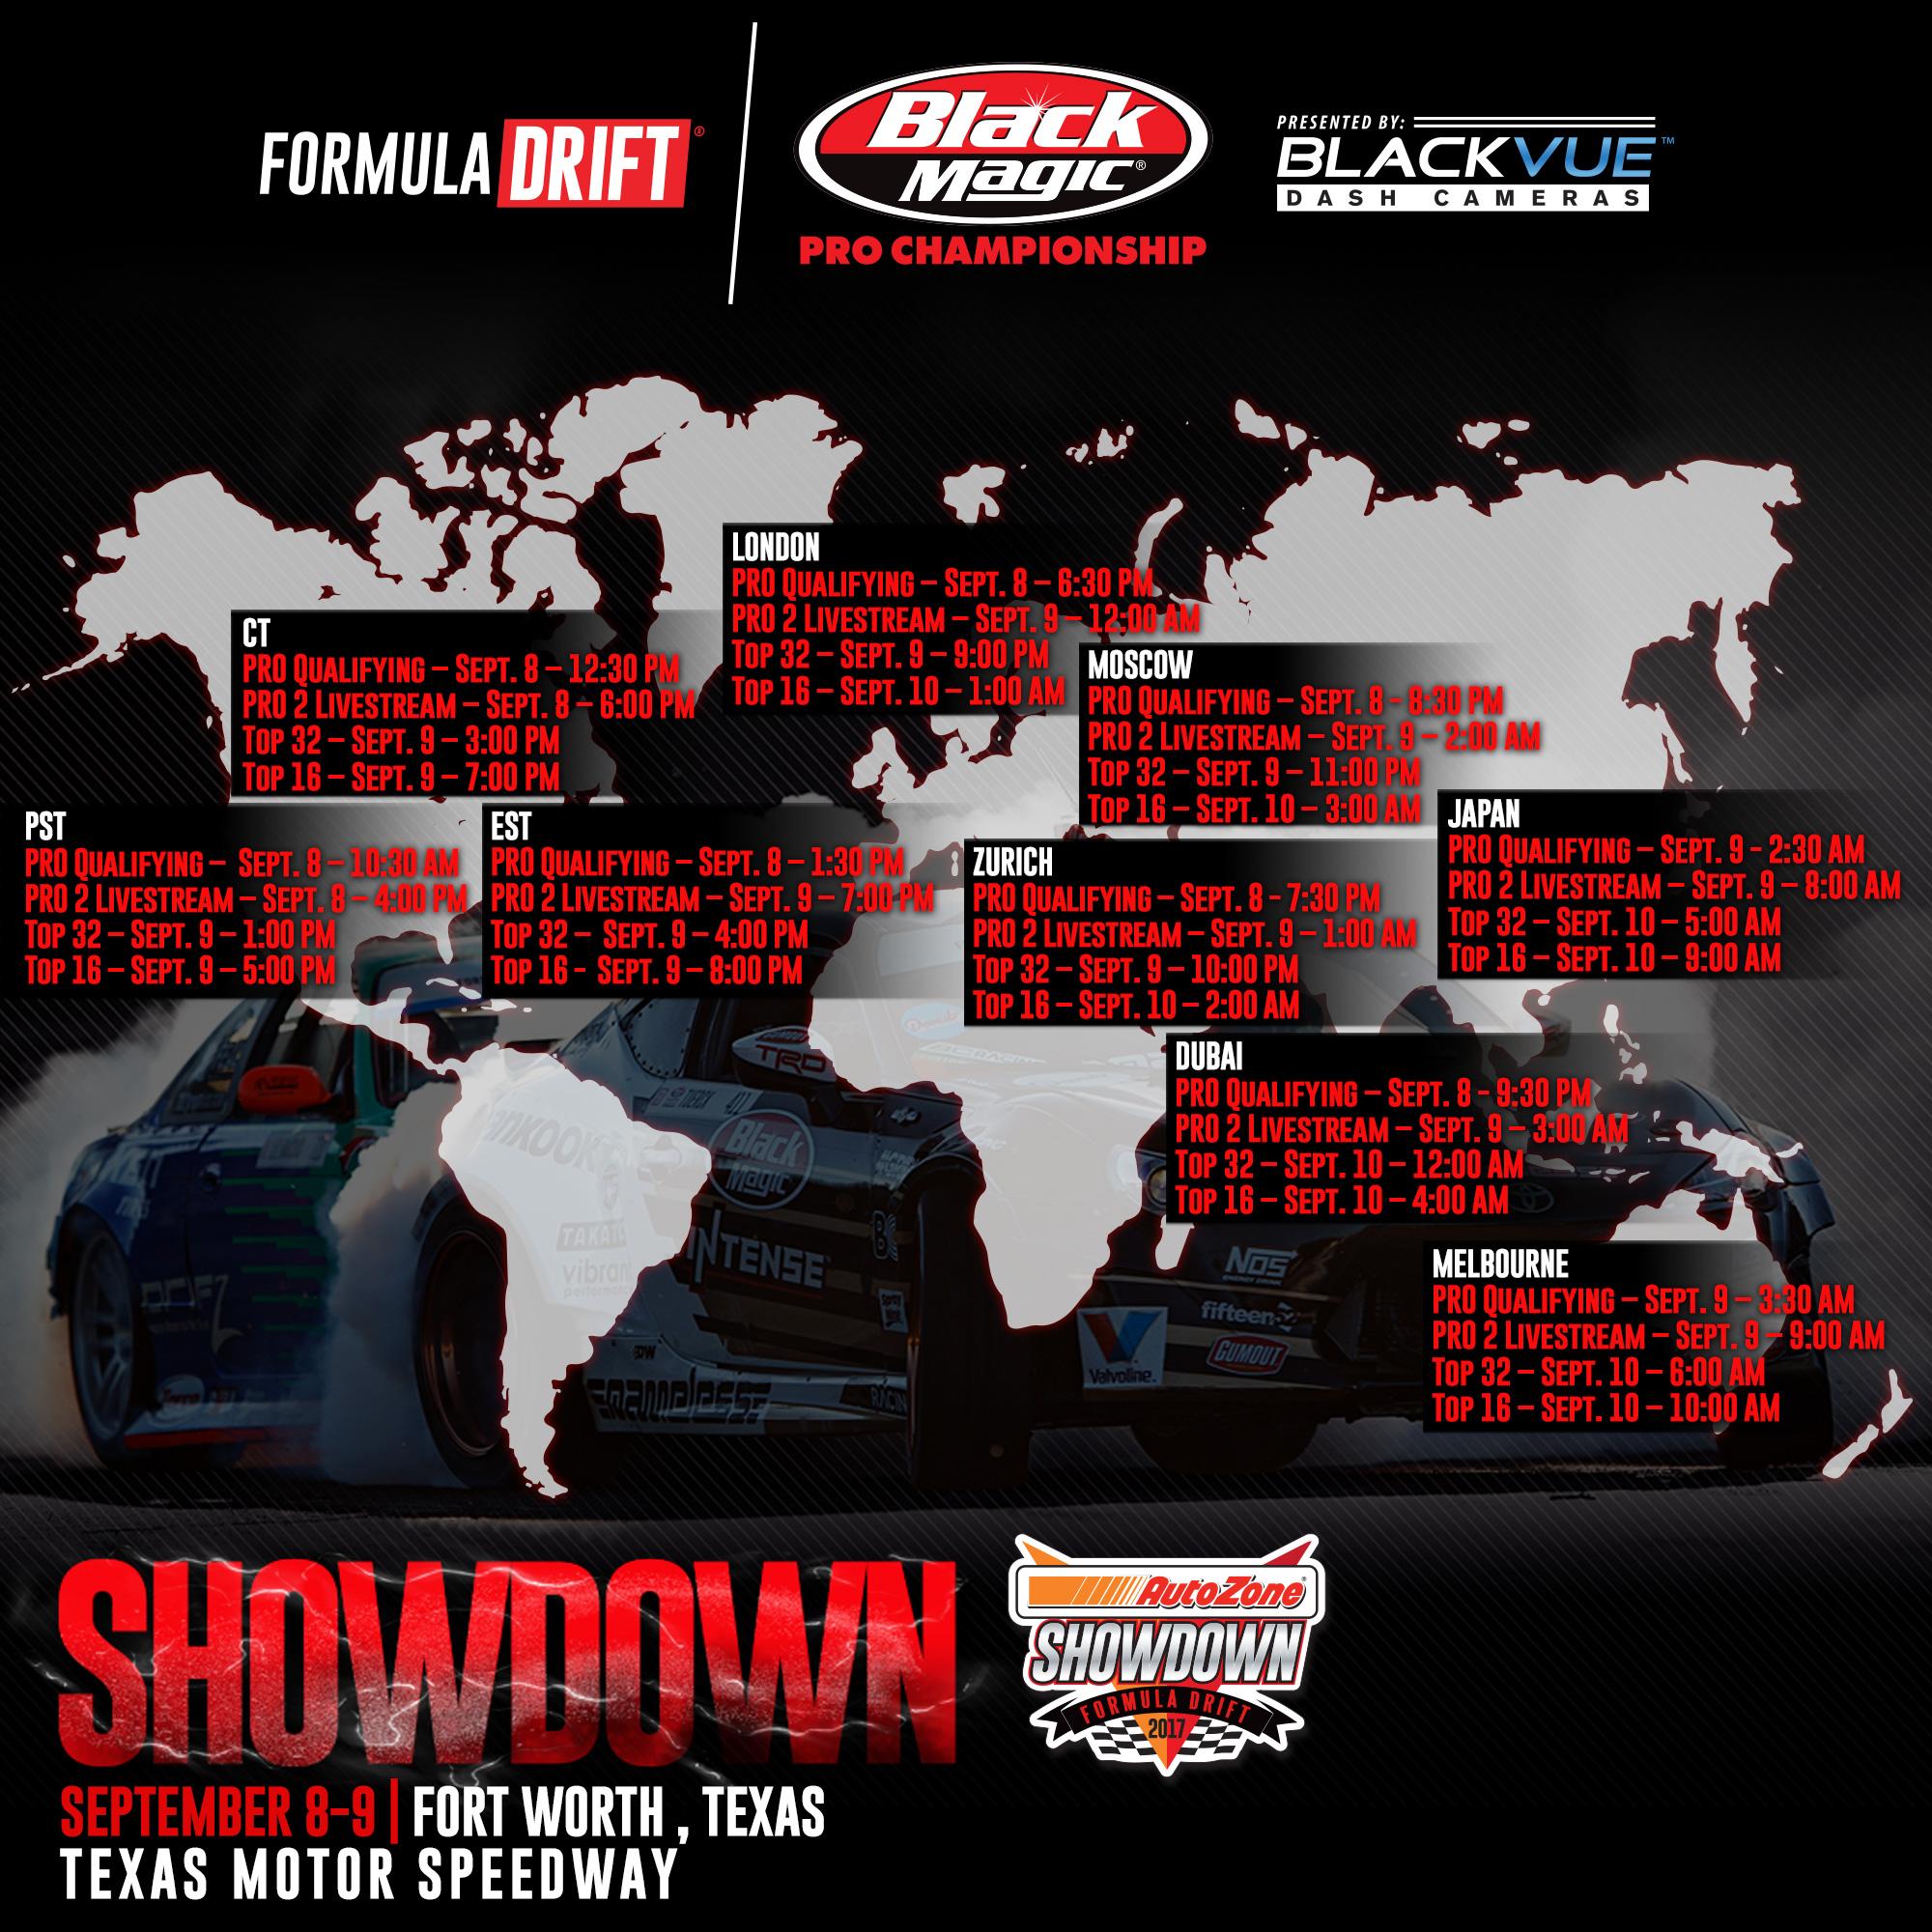 Formula drift round 7 texas motor speedway livestream for Texas motor speedway 2015 schedule